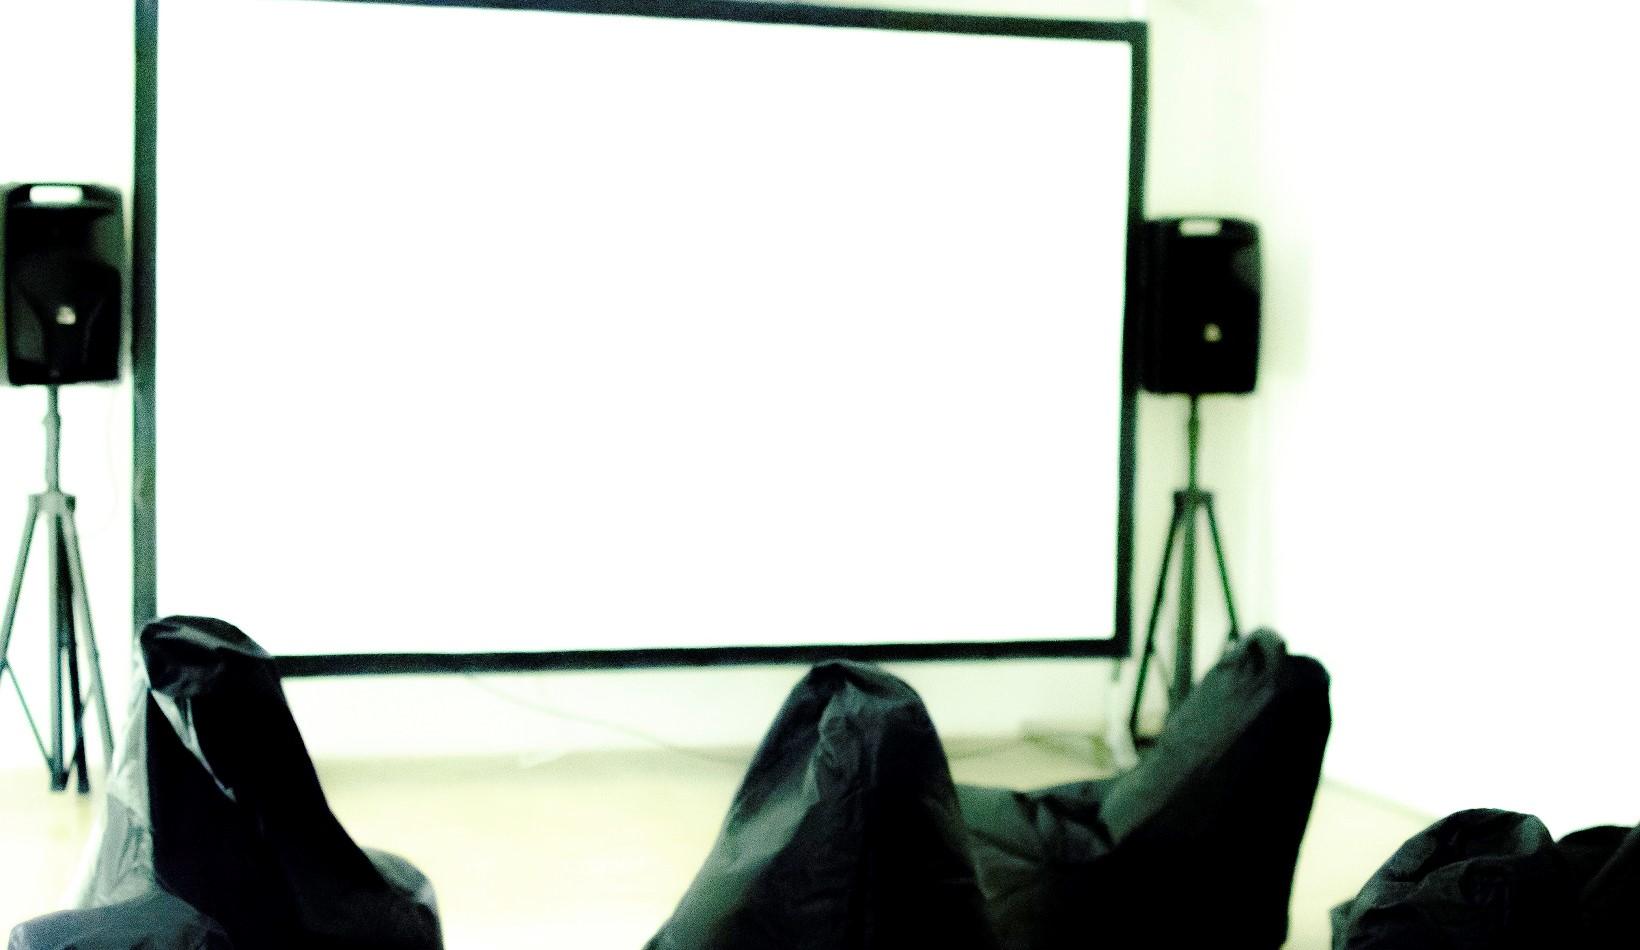 sala cinematografica ridotta